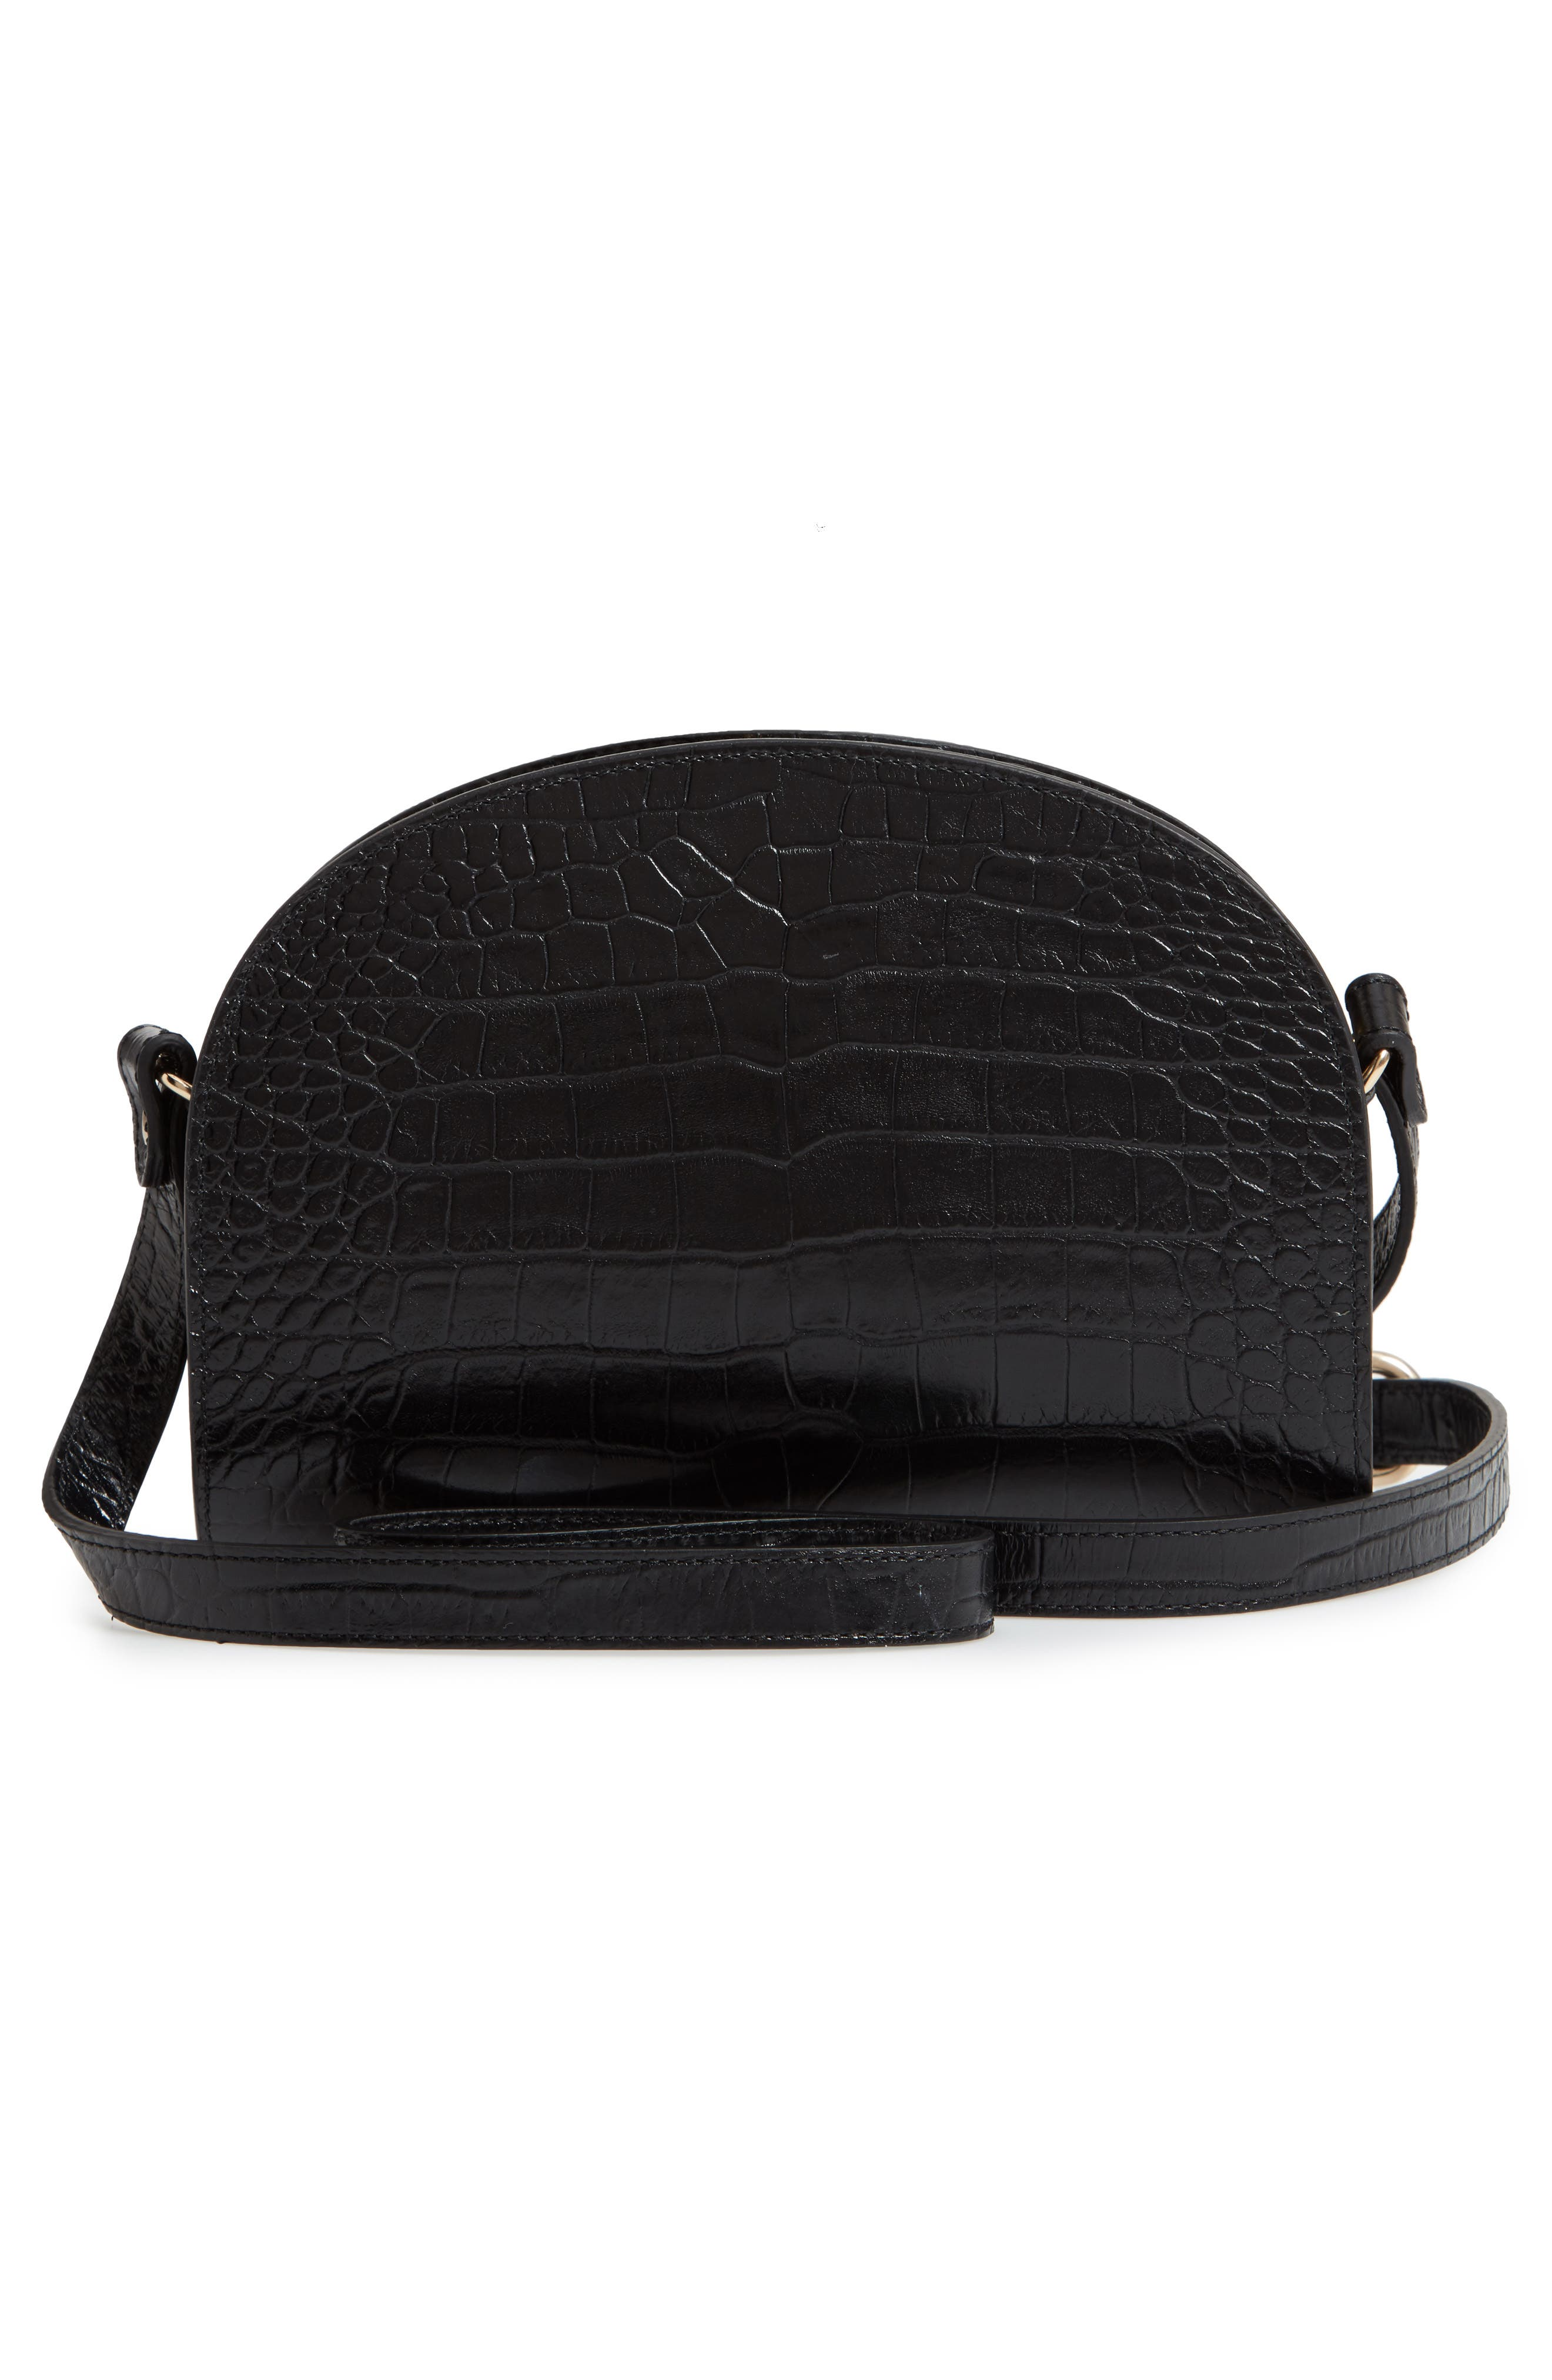 Sac Demi Lune Leather Shoulder Bag,                             Alternate thumbnail 3, color,                             001